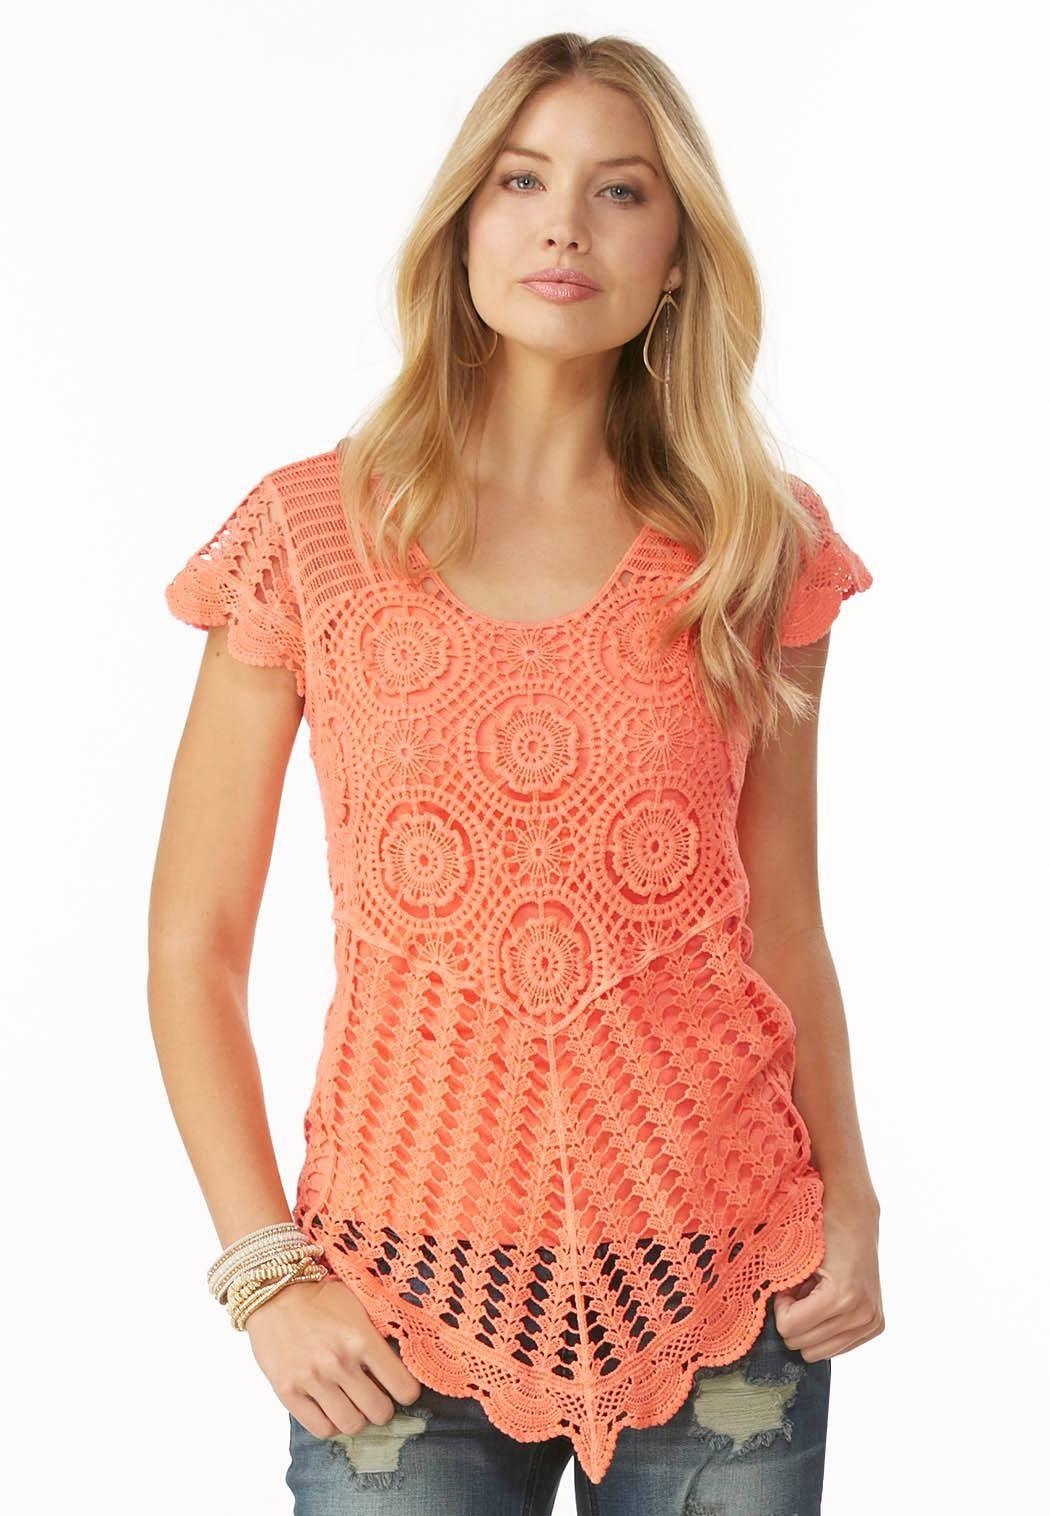 Crochet shirt as an exclusive wardrobe item 28